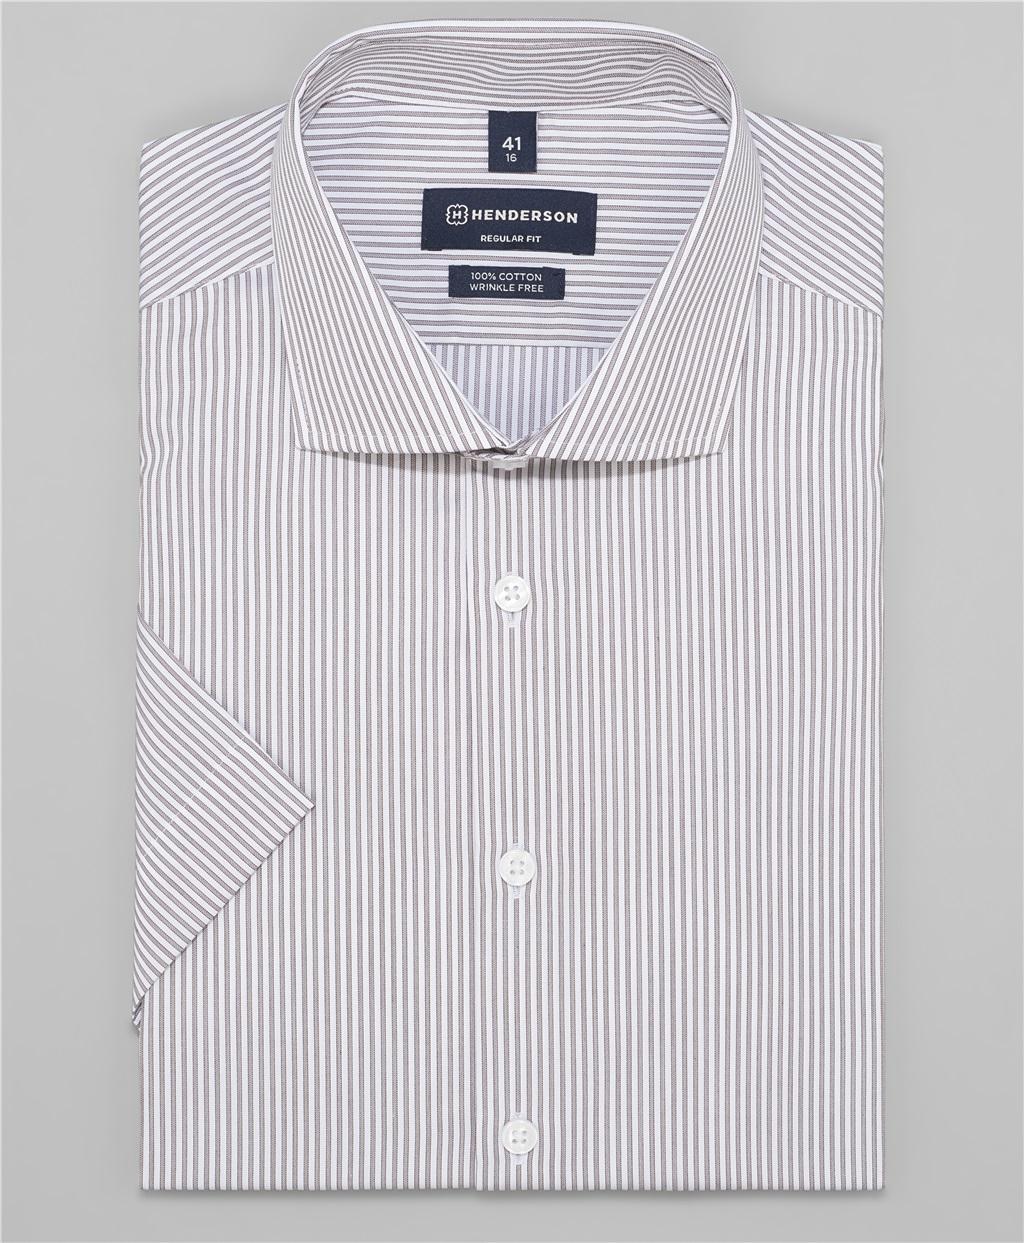 Рубашка прямой силуэт HENDERSON SHS-0472 BROWN фото